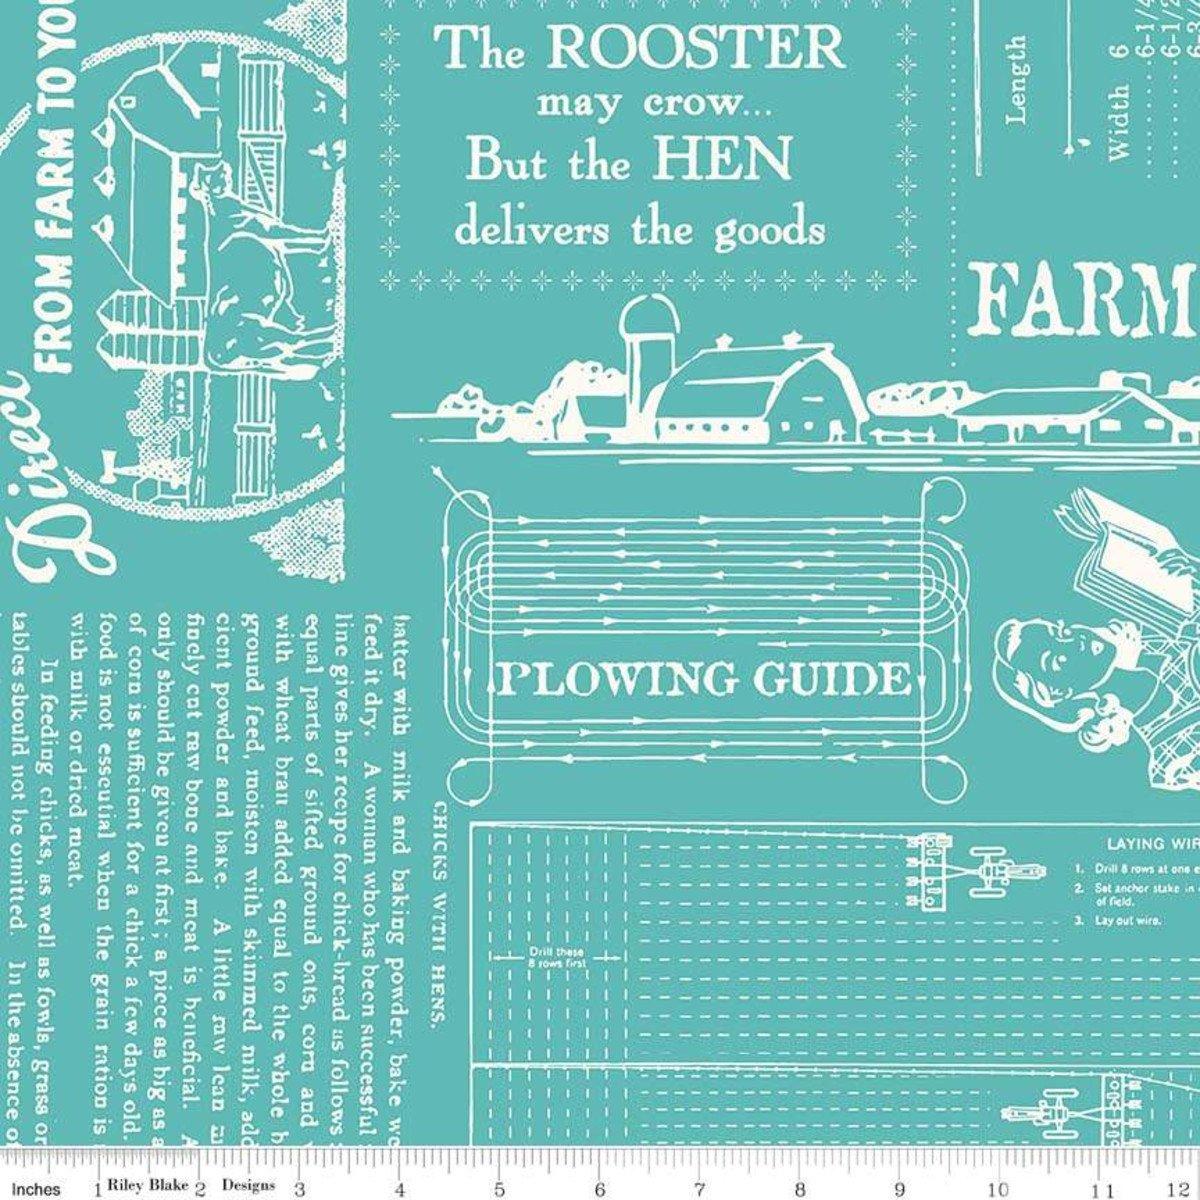 Farm Girl Vintage - Farm Girl Life 108 Wide Back in Cottage for Riley Blake Designs